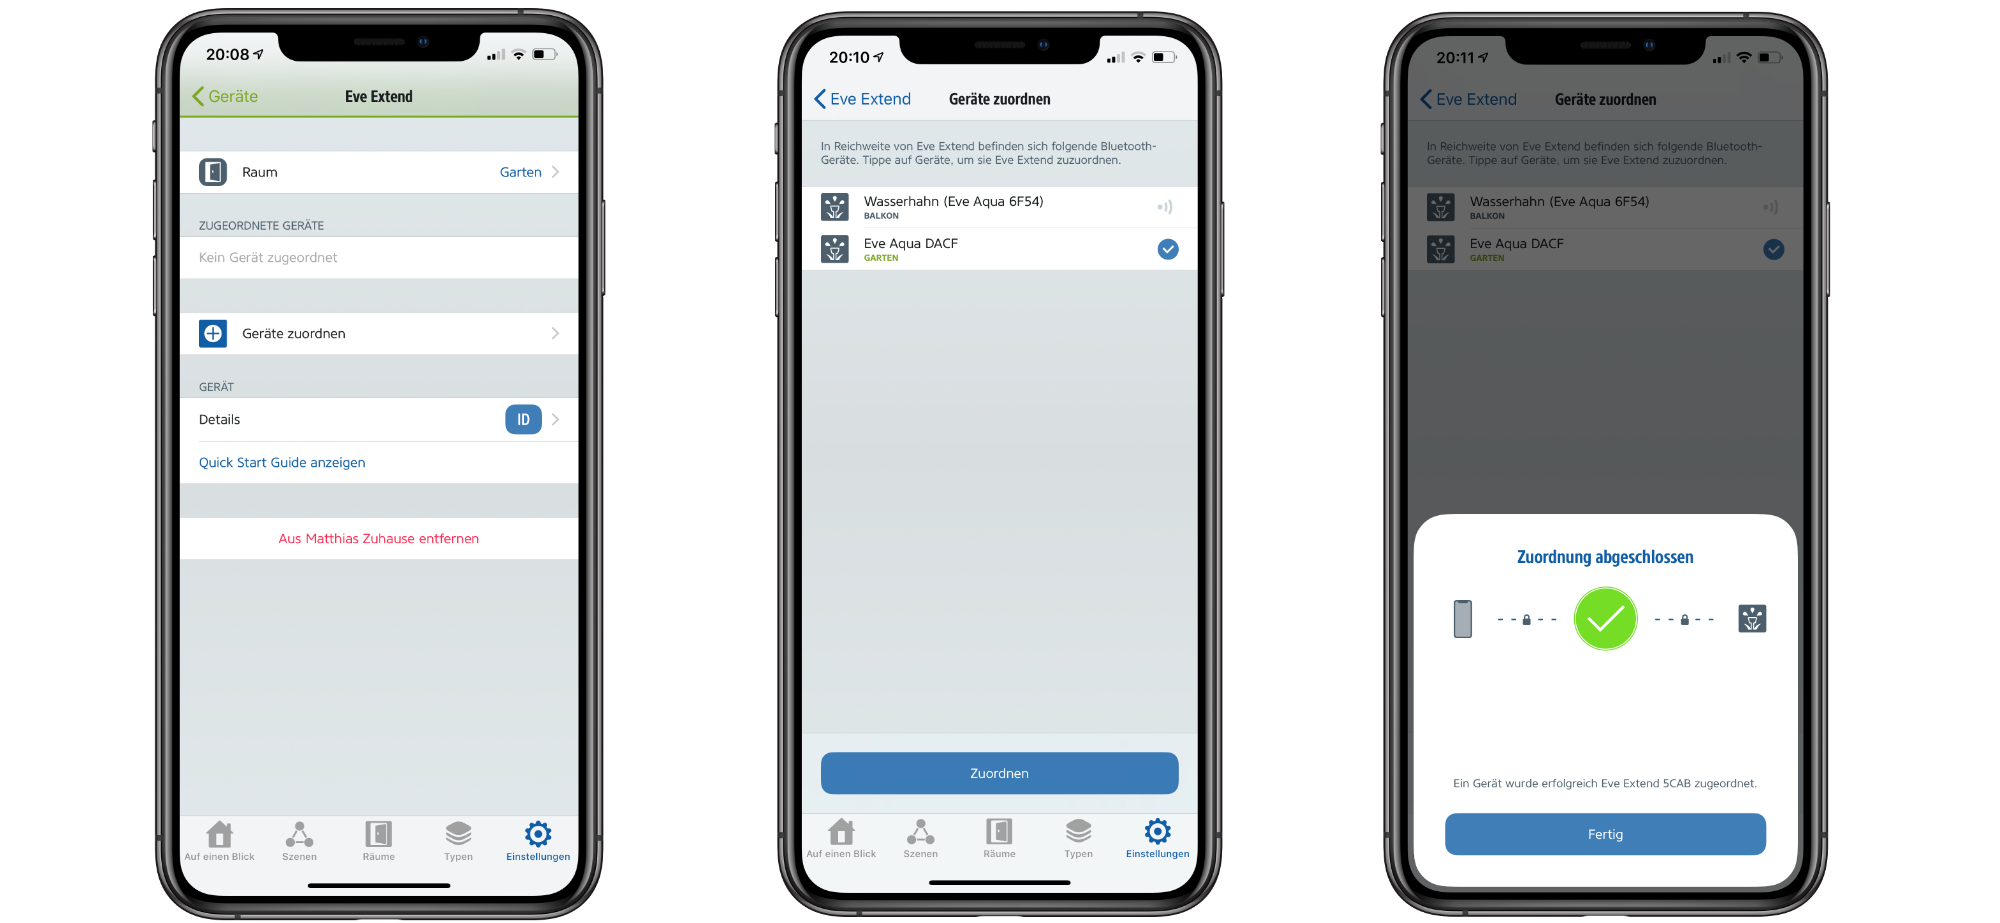 Eve_Extend_Bluetooth_Repeater_HomeKit_WiFi_WLAN_Gateway_Review6 Eve Extend von Eve - Bluetoothreichweite unter Apple HomeKit ins WiFi verlagern